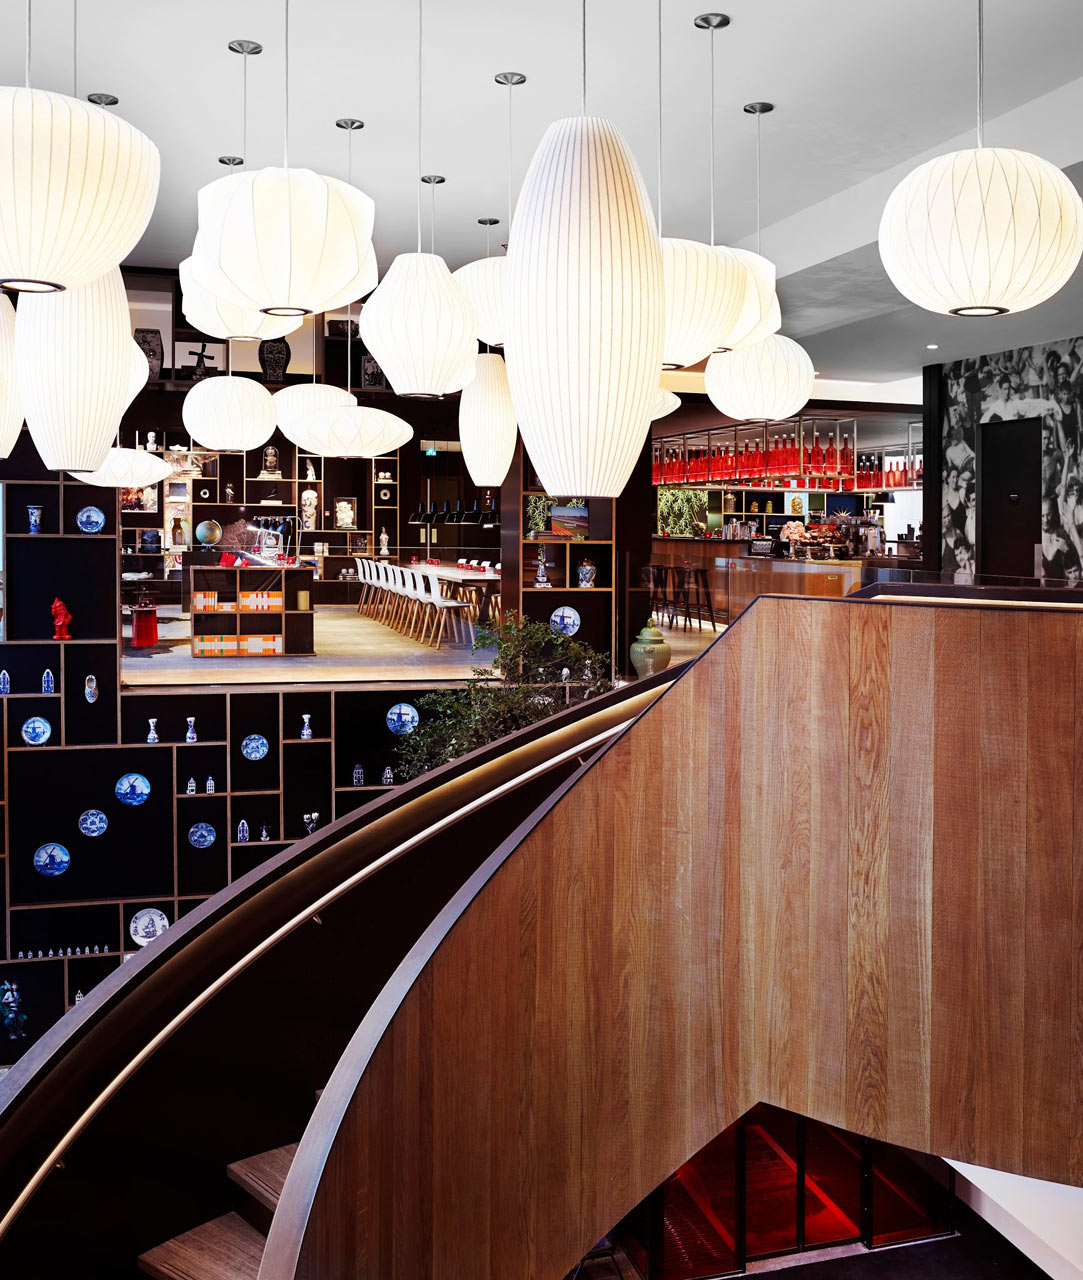 Destin-citizenM_Rotterdam-hotel-2